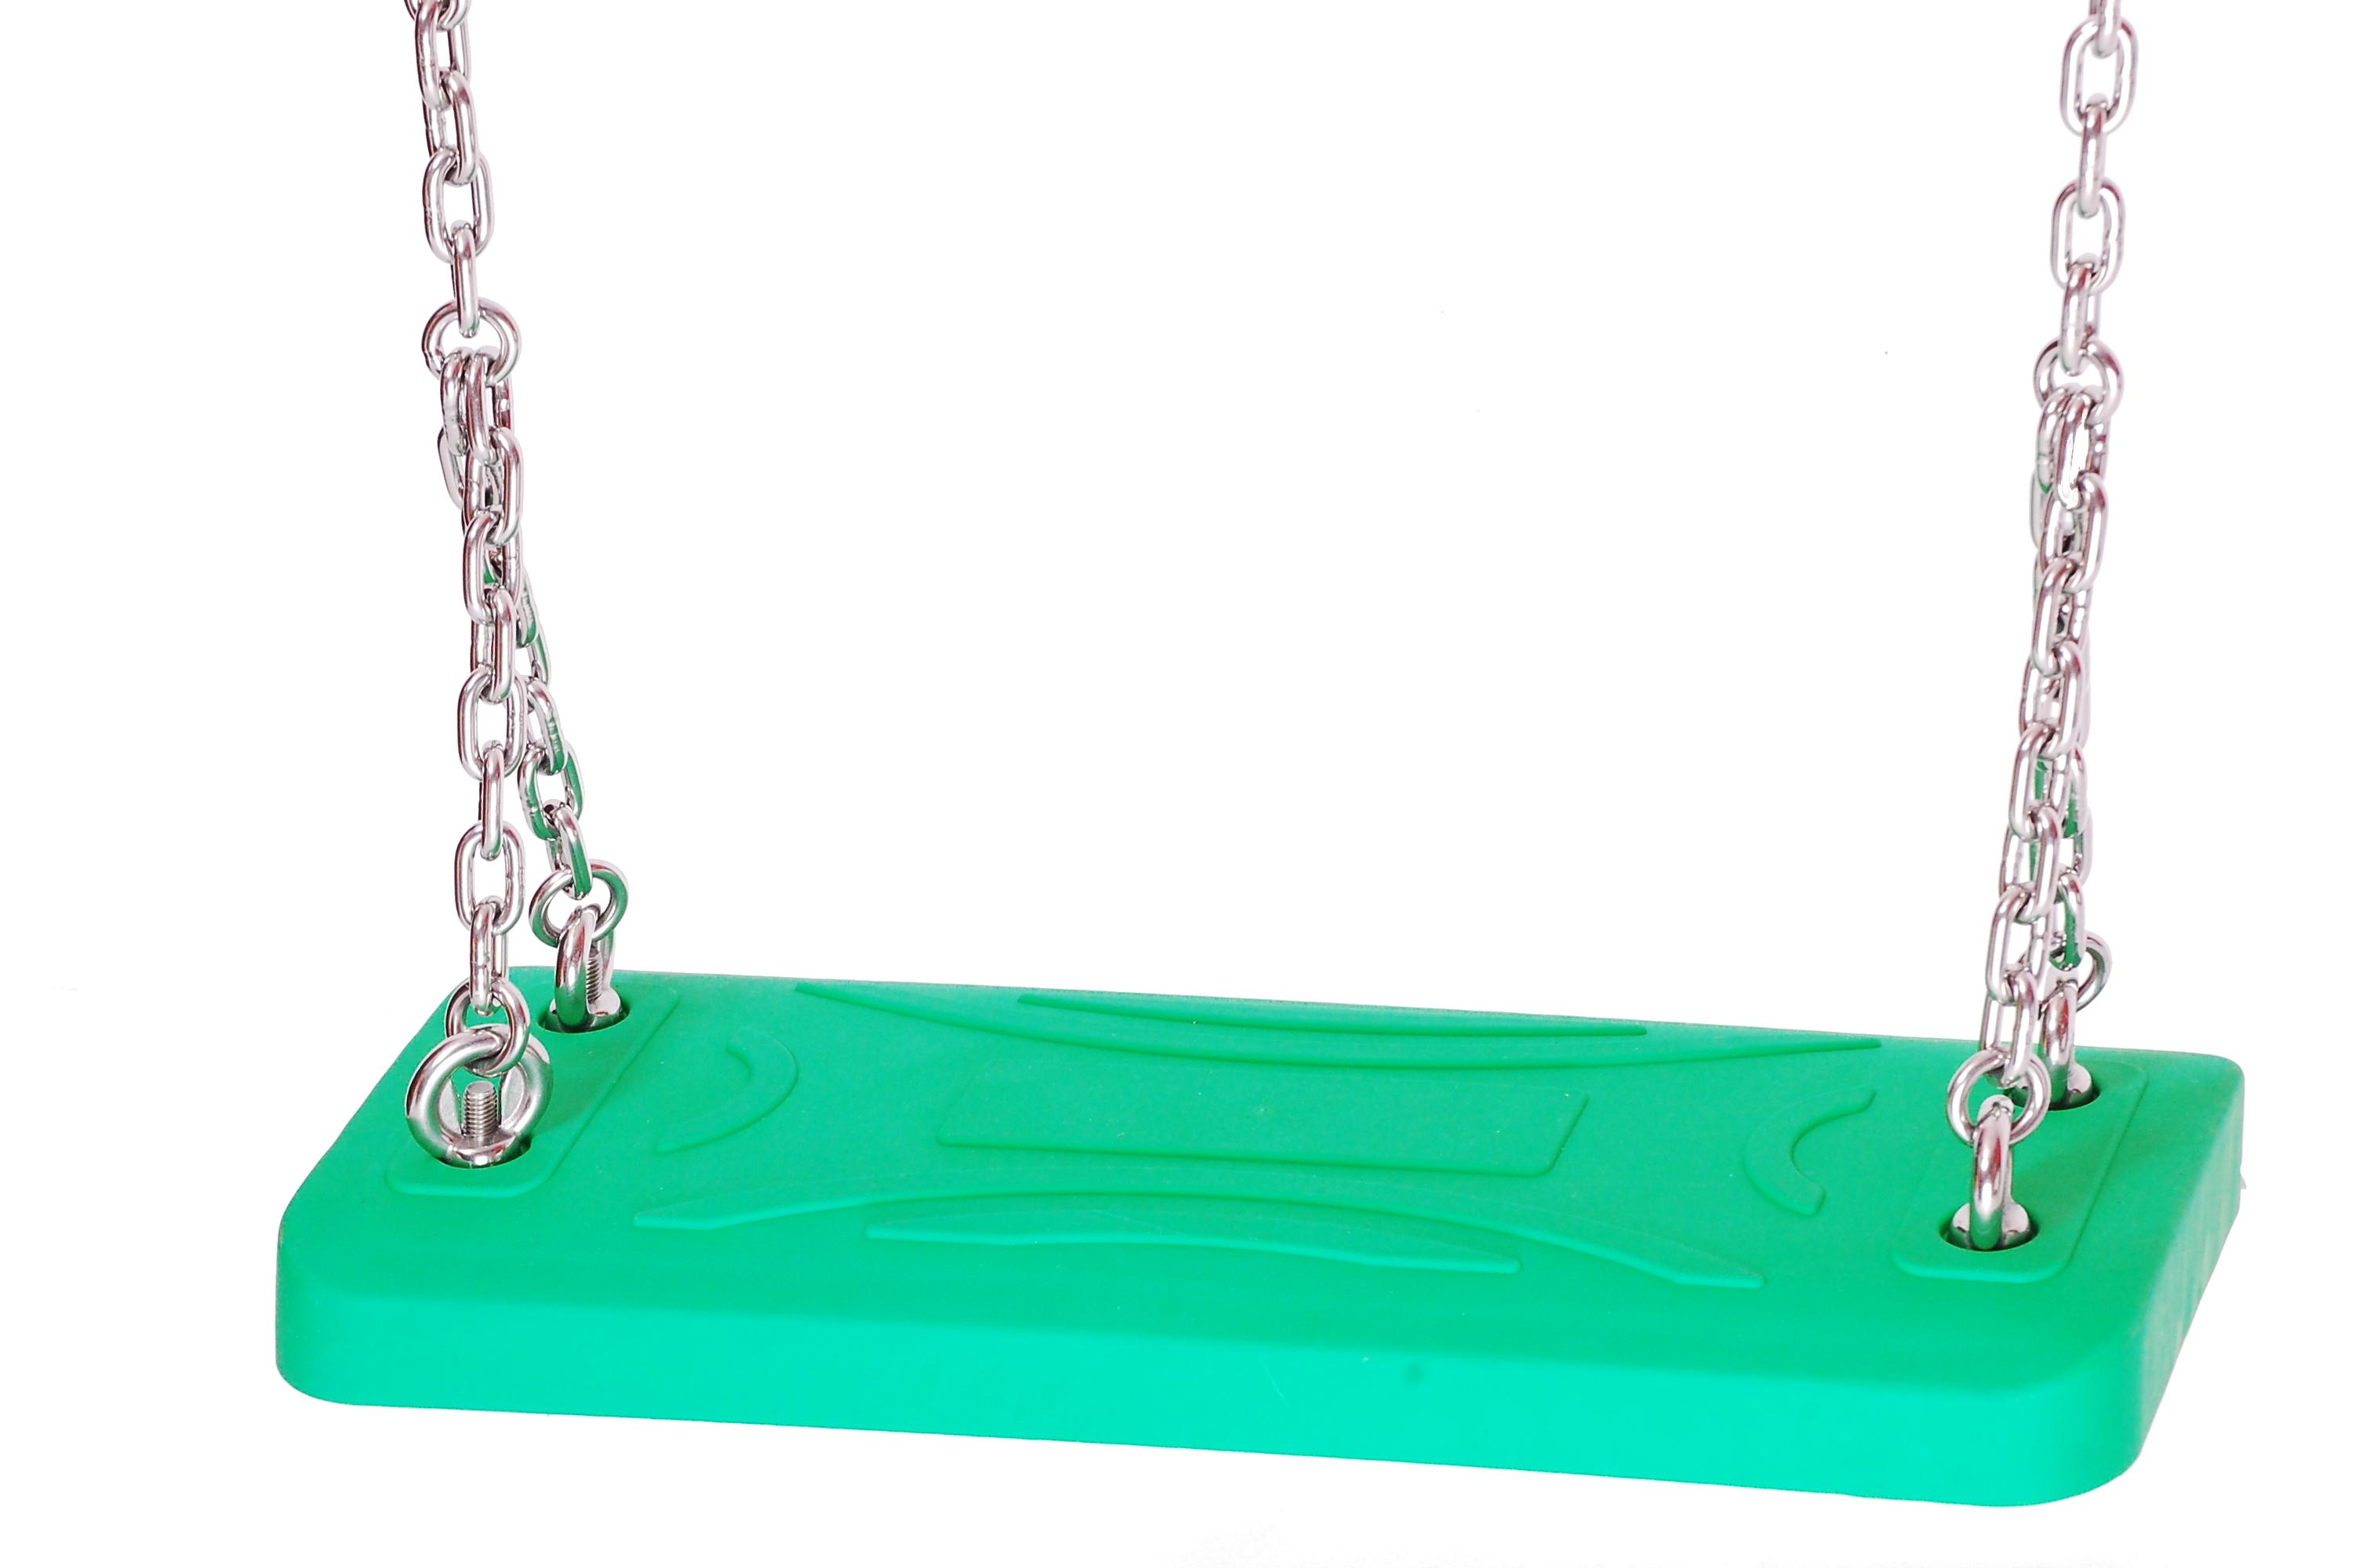 Swinging Aluminium Insert Heavy Duty Swing Seat With Chains